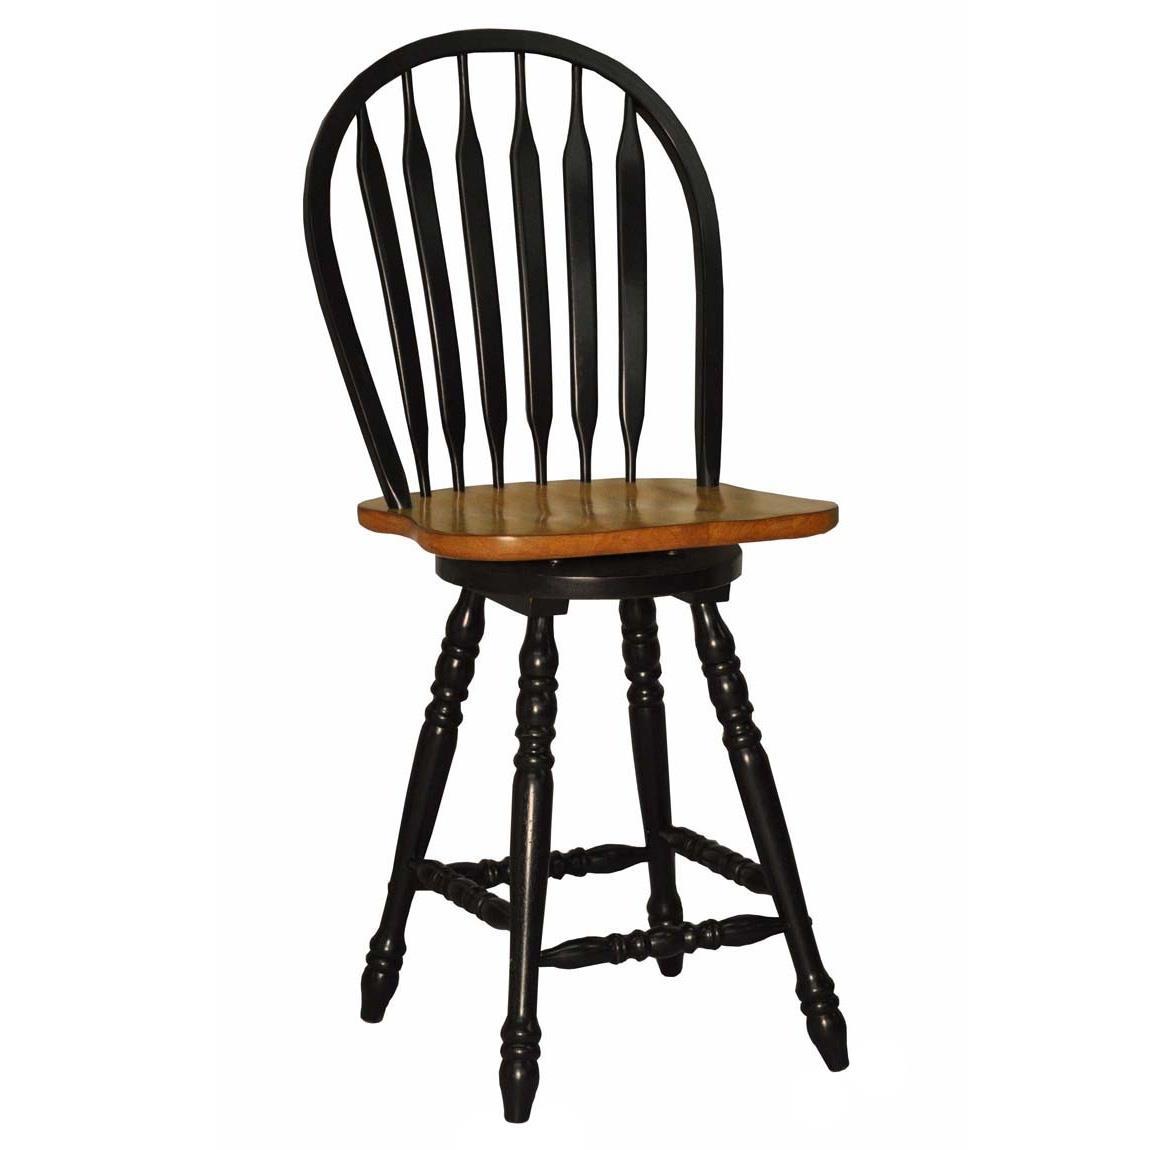 E.C.I. Furniture Dining  Large Bow Back Counter Stool - Black - Item Number: 2190-10-BS24